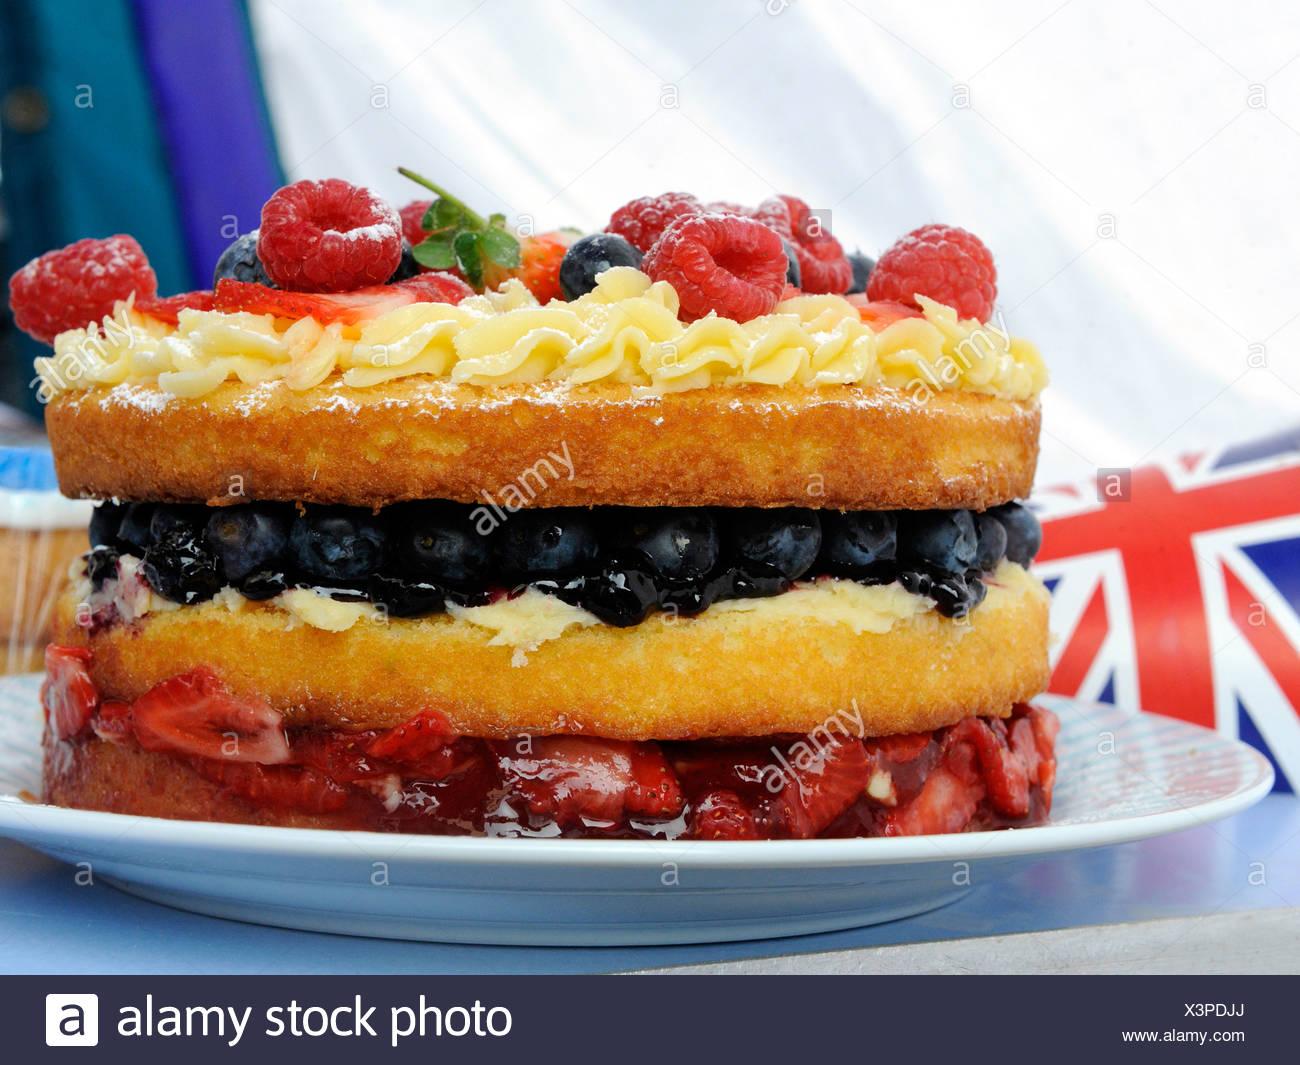 A British cake, at a vintage patriotic tea party. - Stock Image